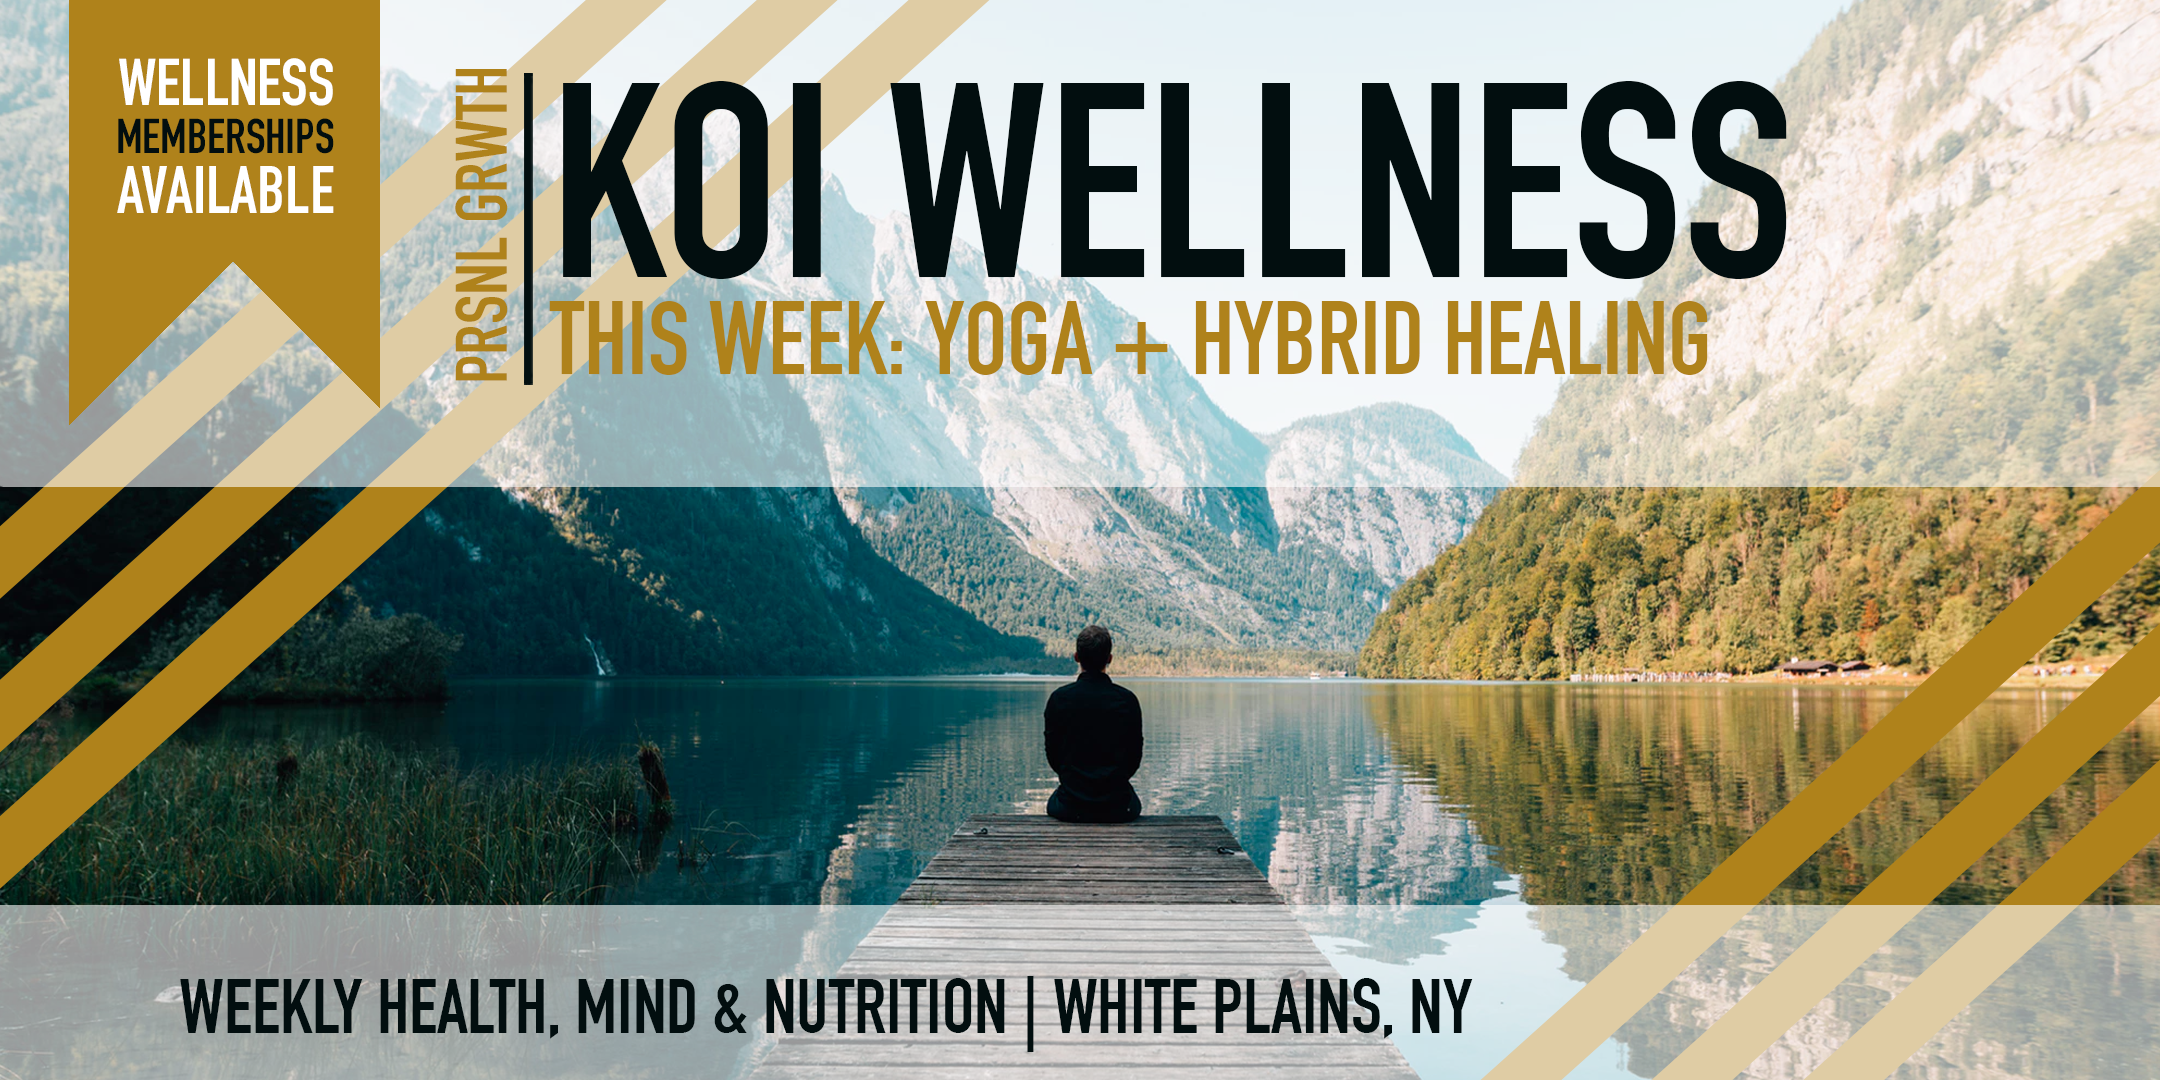 KOI wellness eventbrite hybrid healing.png